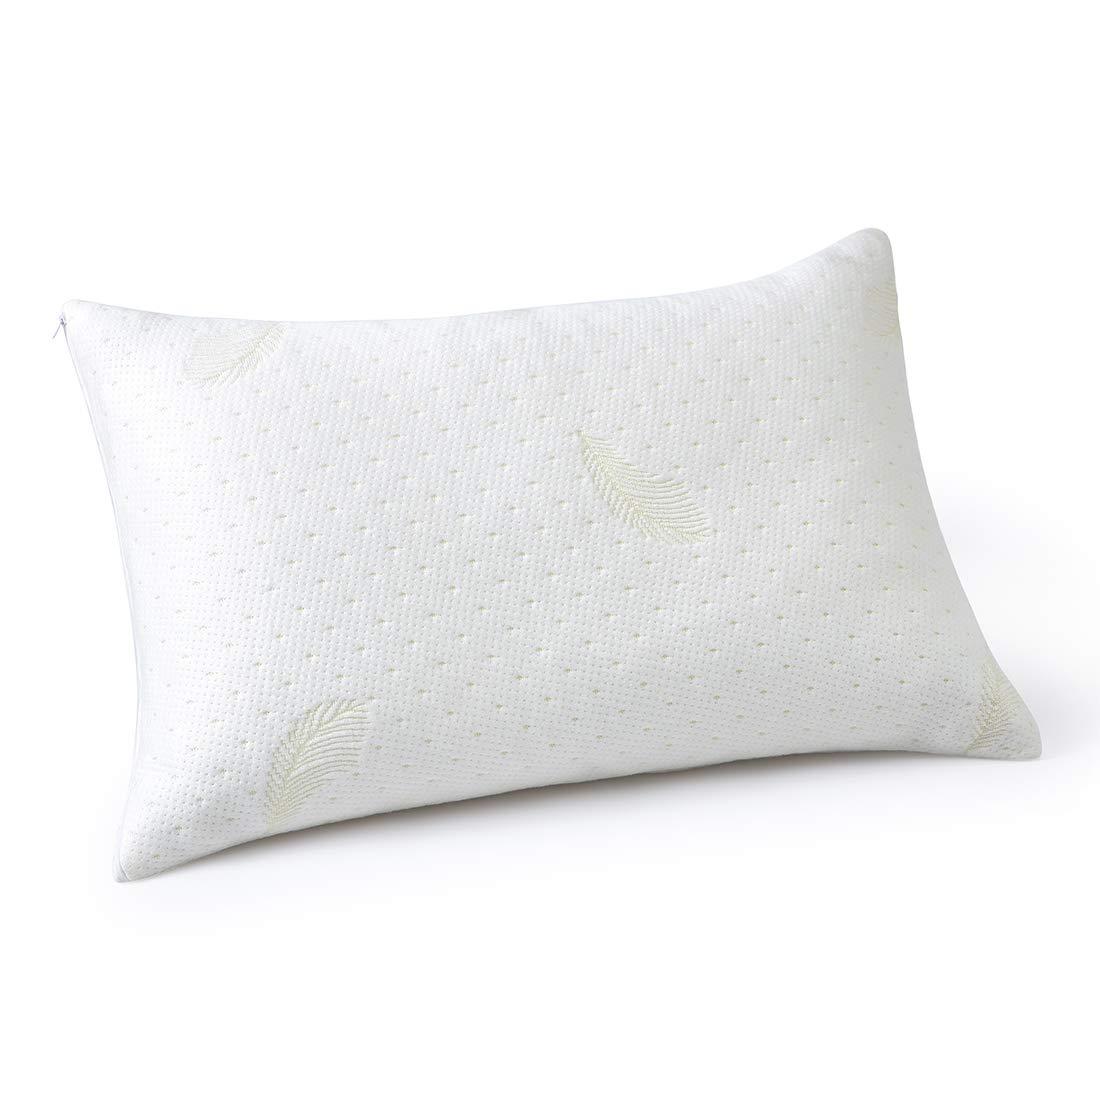 Eastar Zippered Pillow Protector Pillowcase,Queen Size 20x30